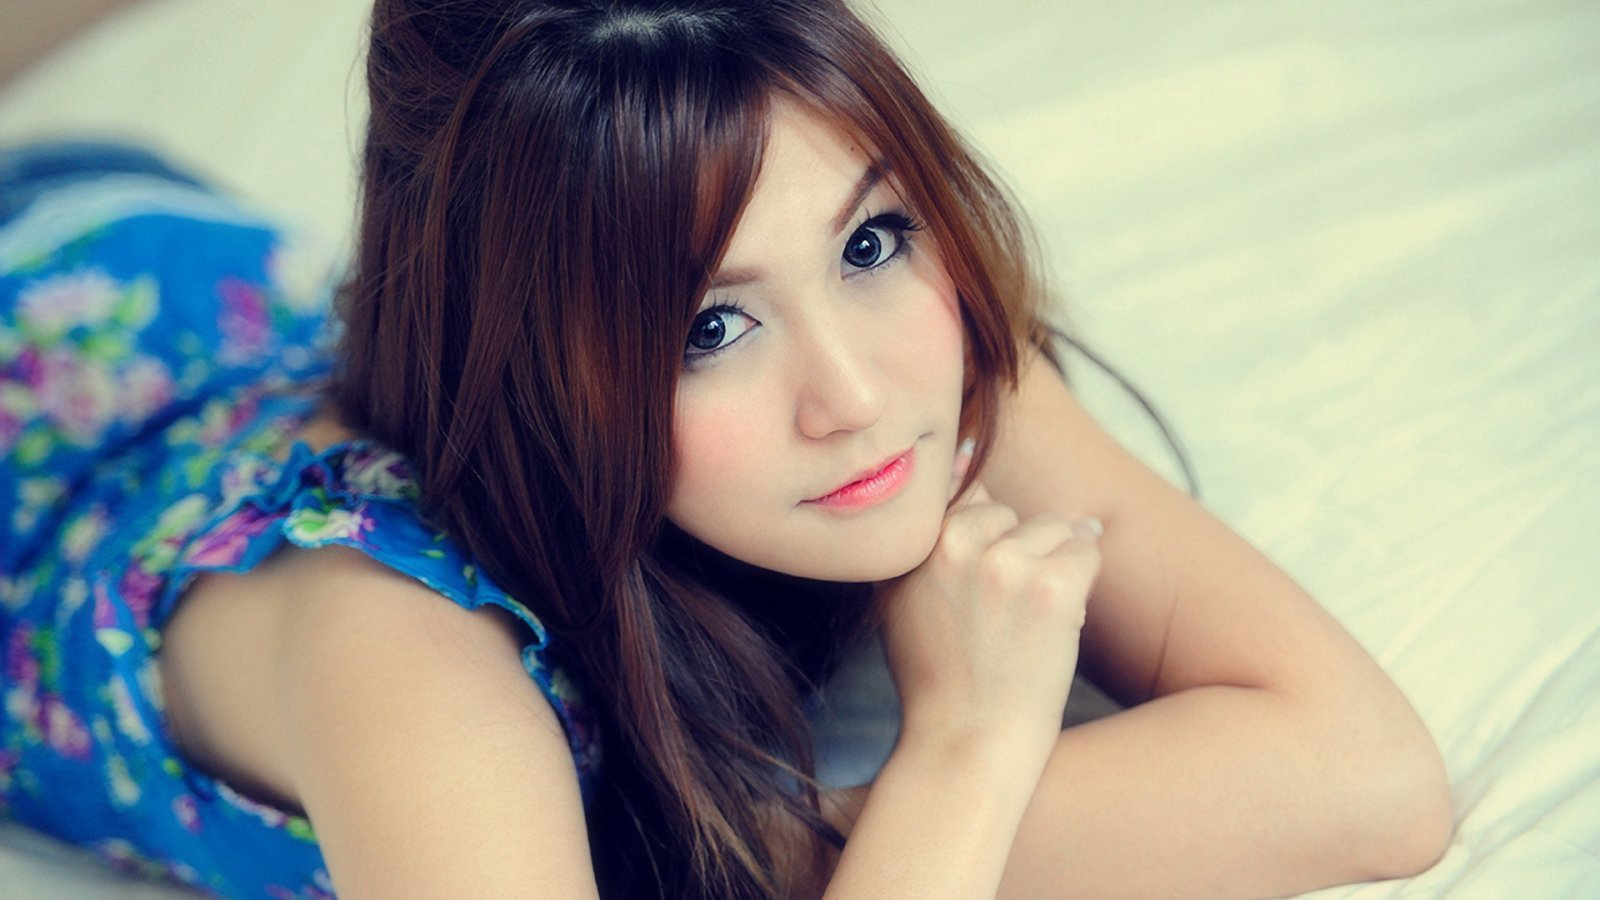 Beautiful Girl HD Wallpaper